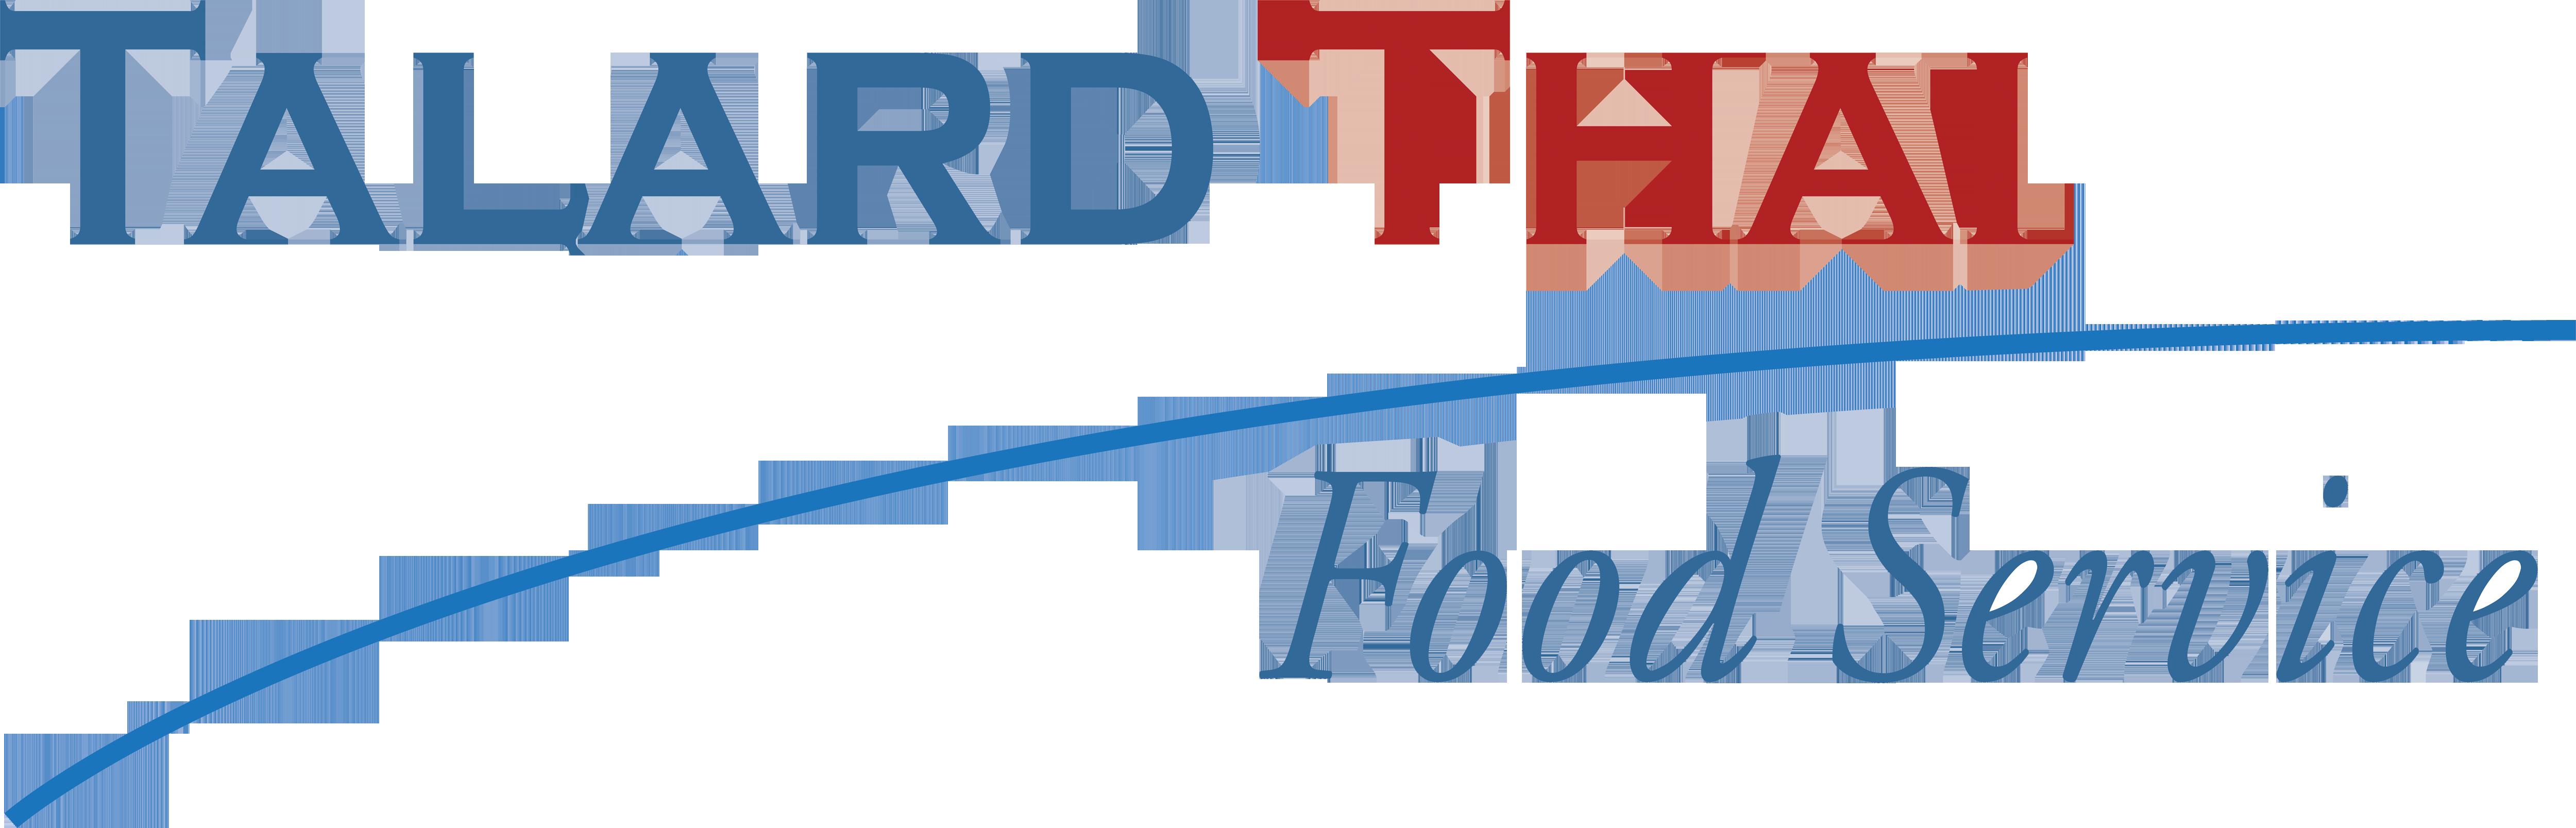 Talard Thai Food Service